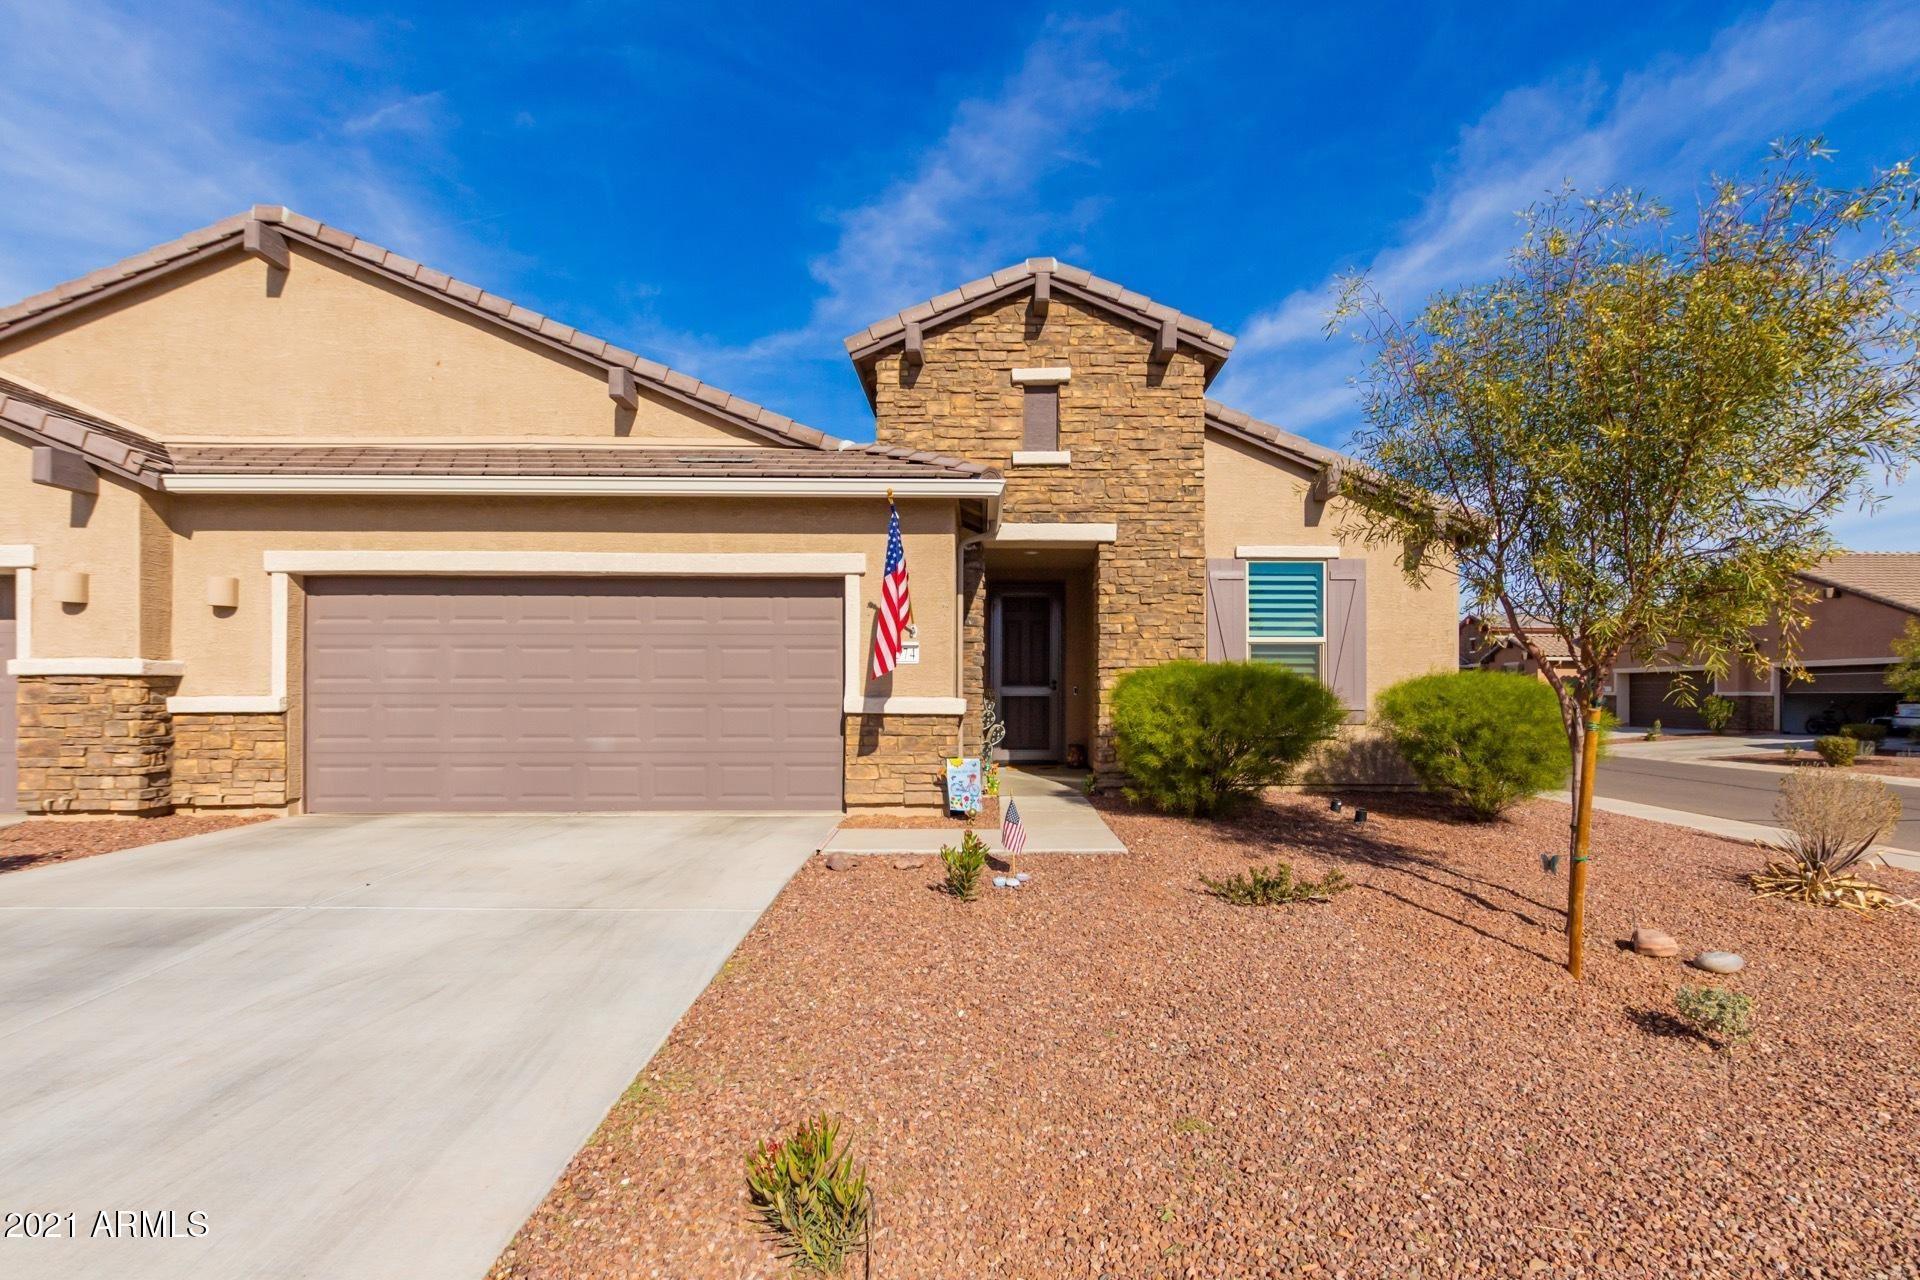 41574 W SUMMER WIND Way, Maricopa, AZ 85138 - MLS#: 6181313